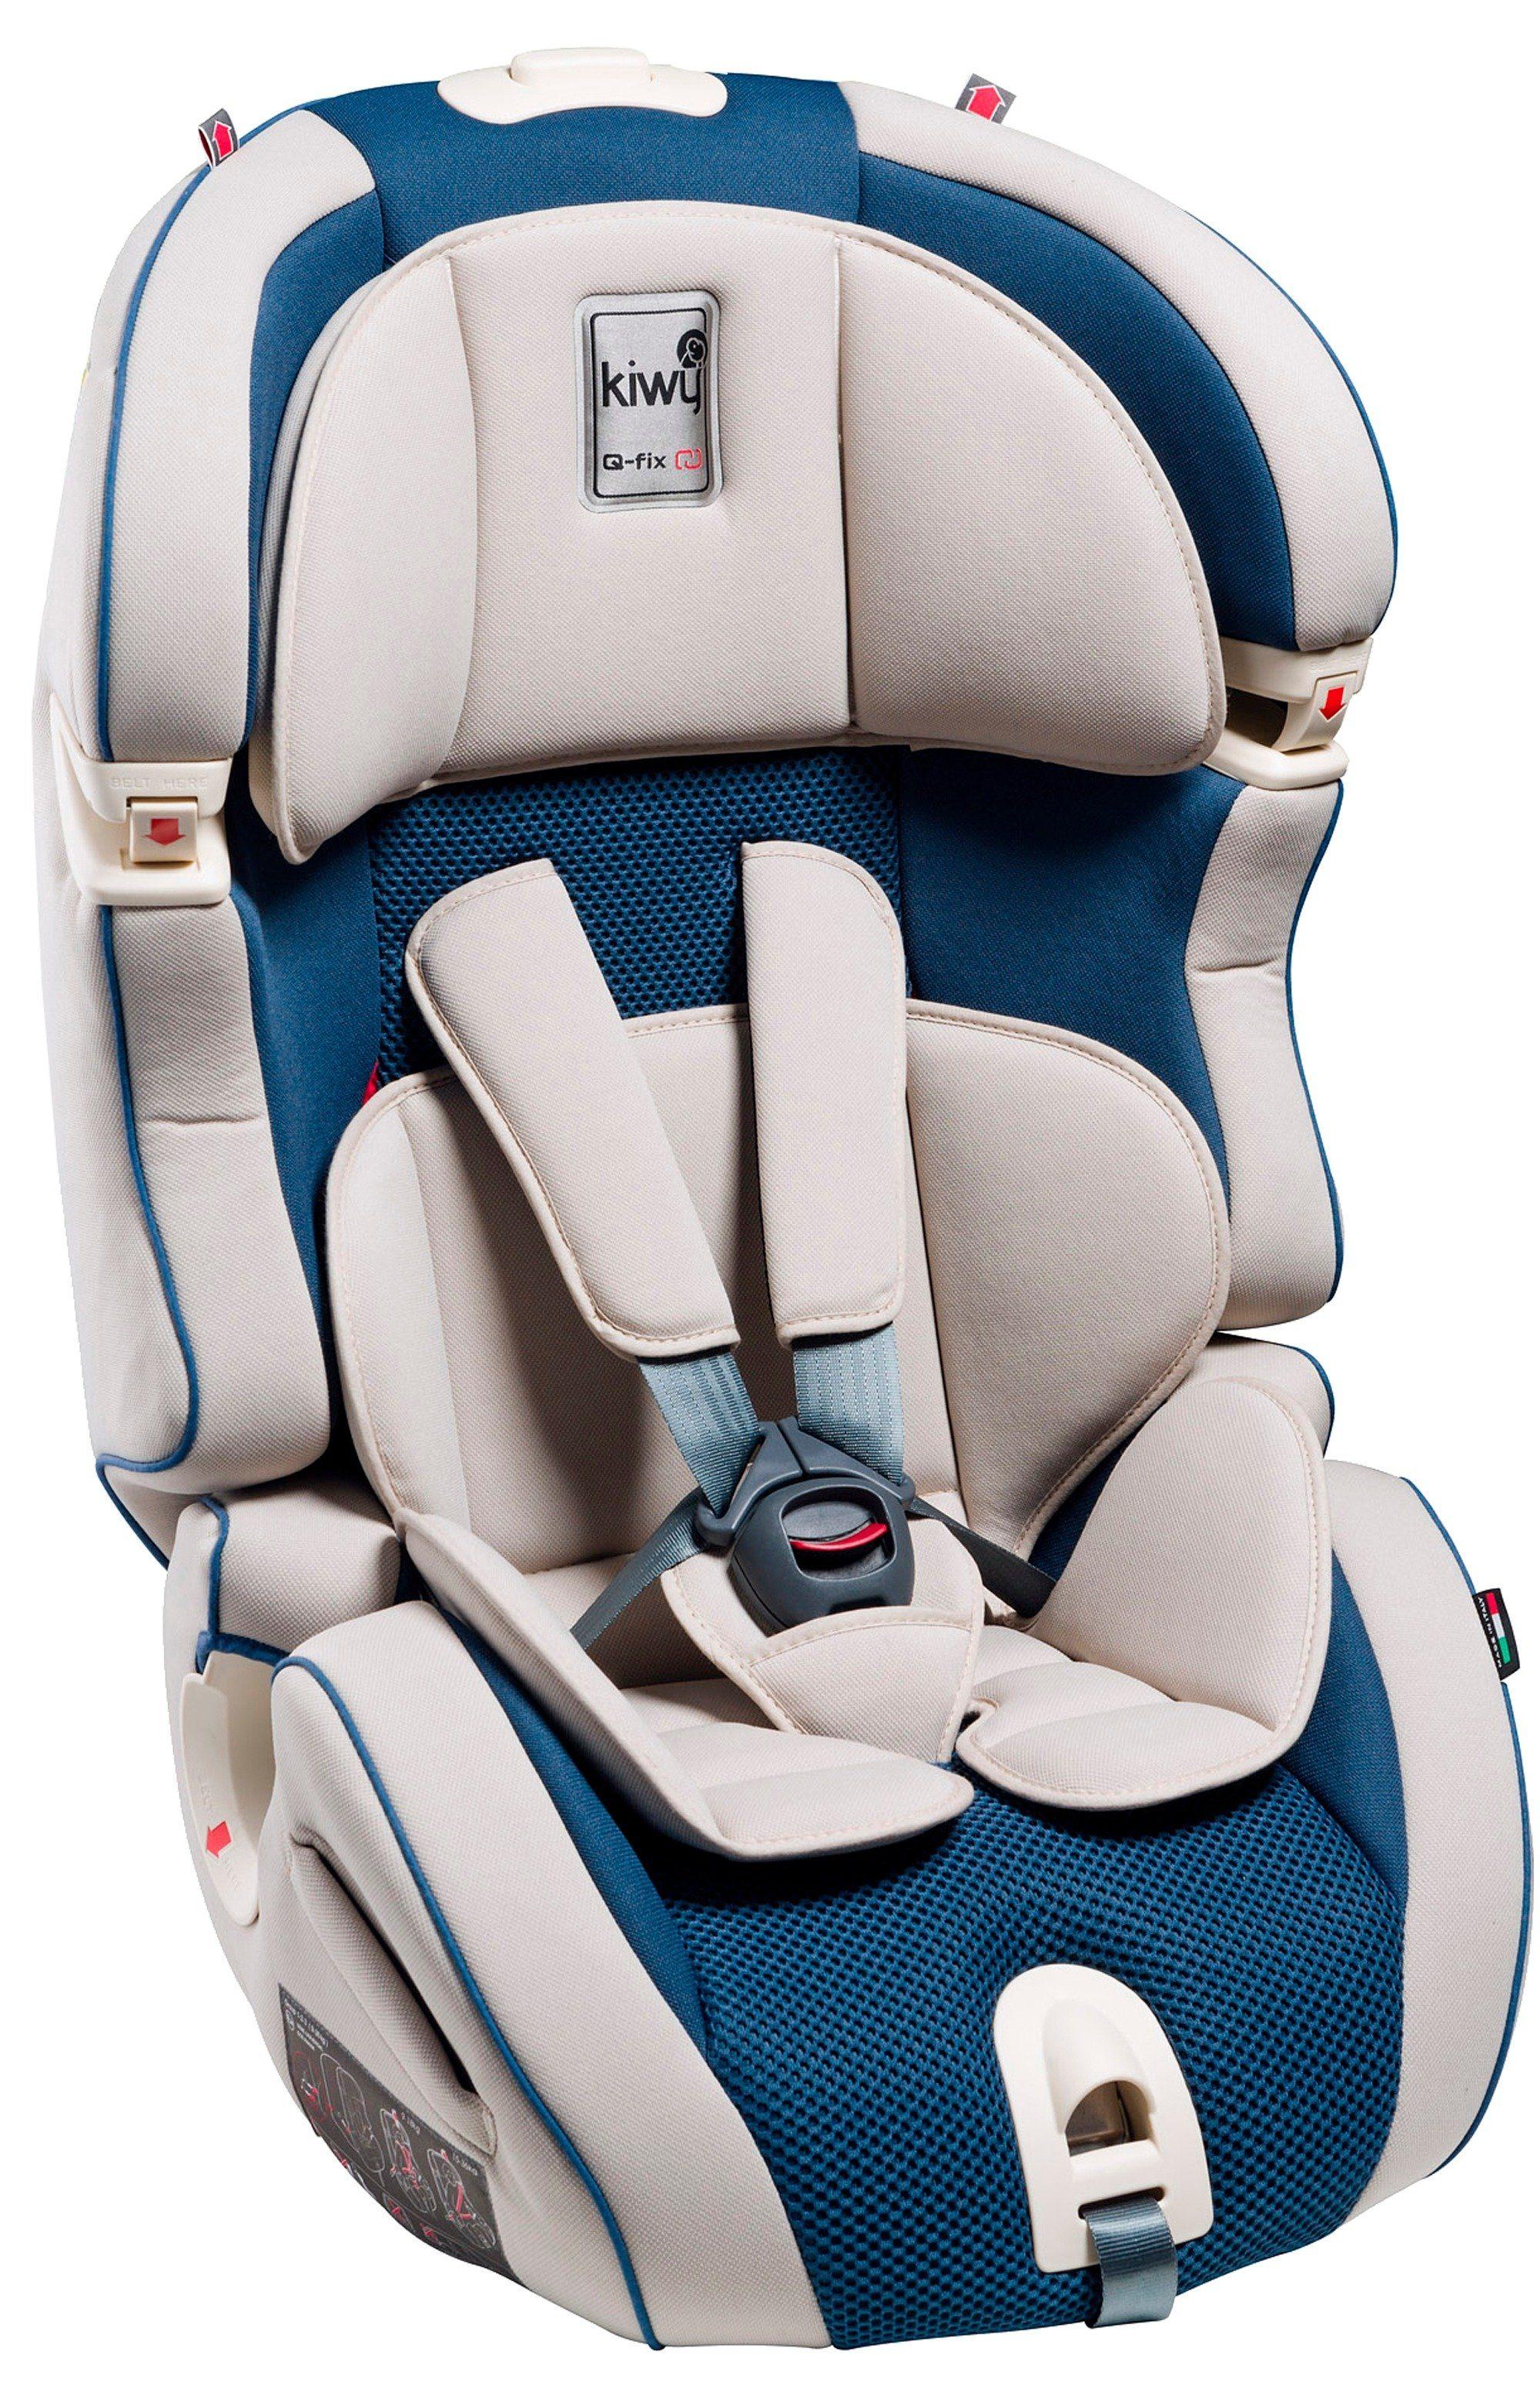 Kiwy Kindersitz »kiwy SLF123 mit Q-Fix Adapter für Isofix Haltepunkt im Auto, ocean«